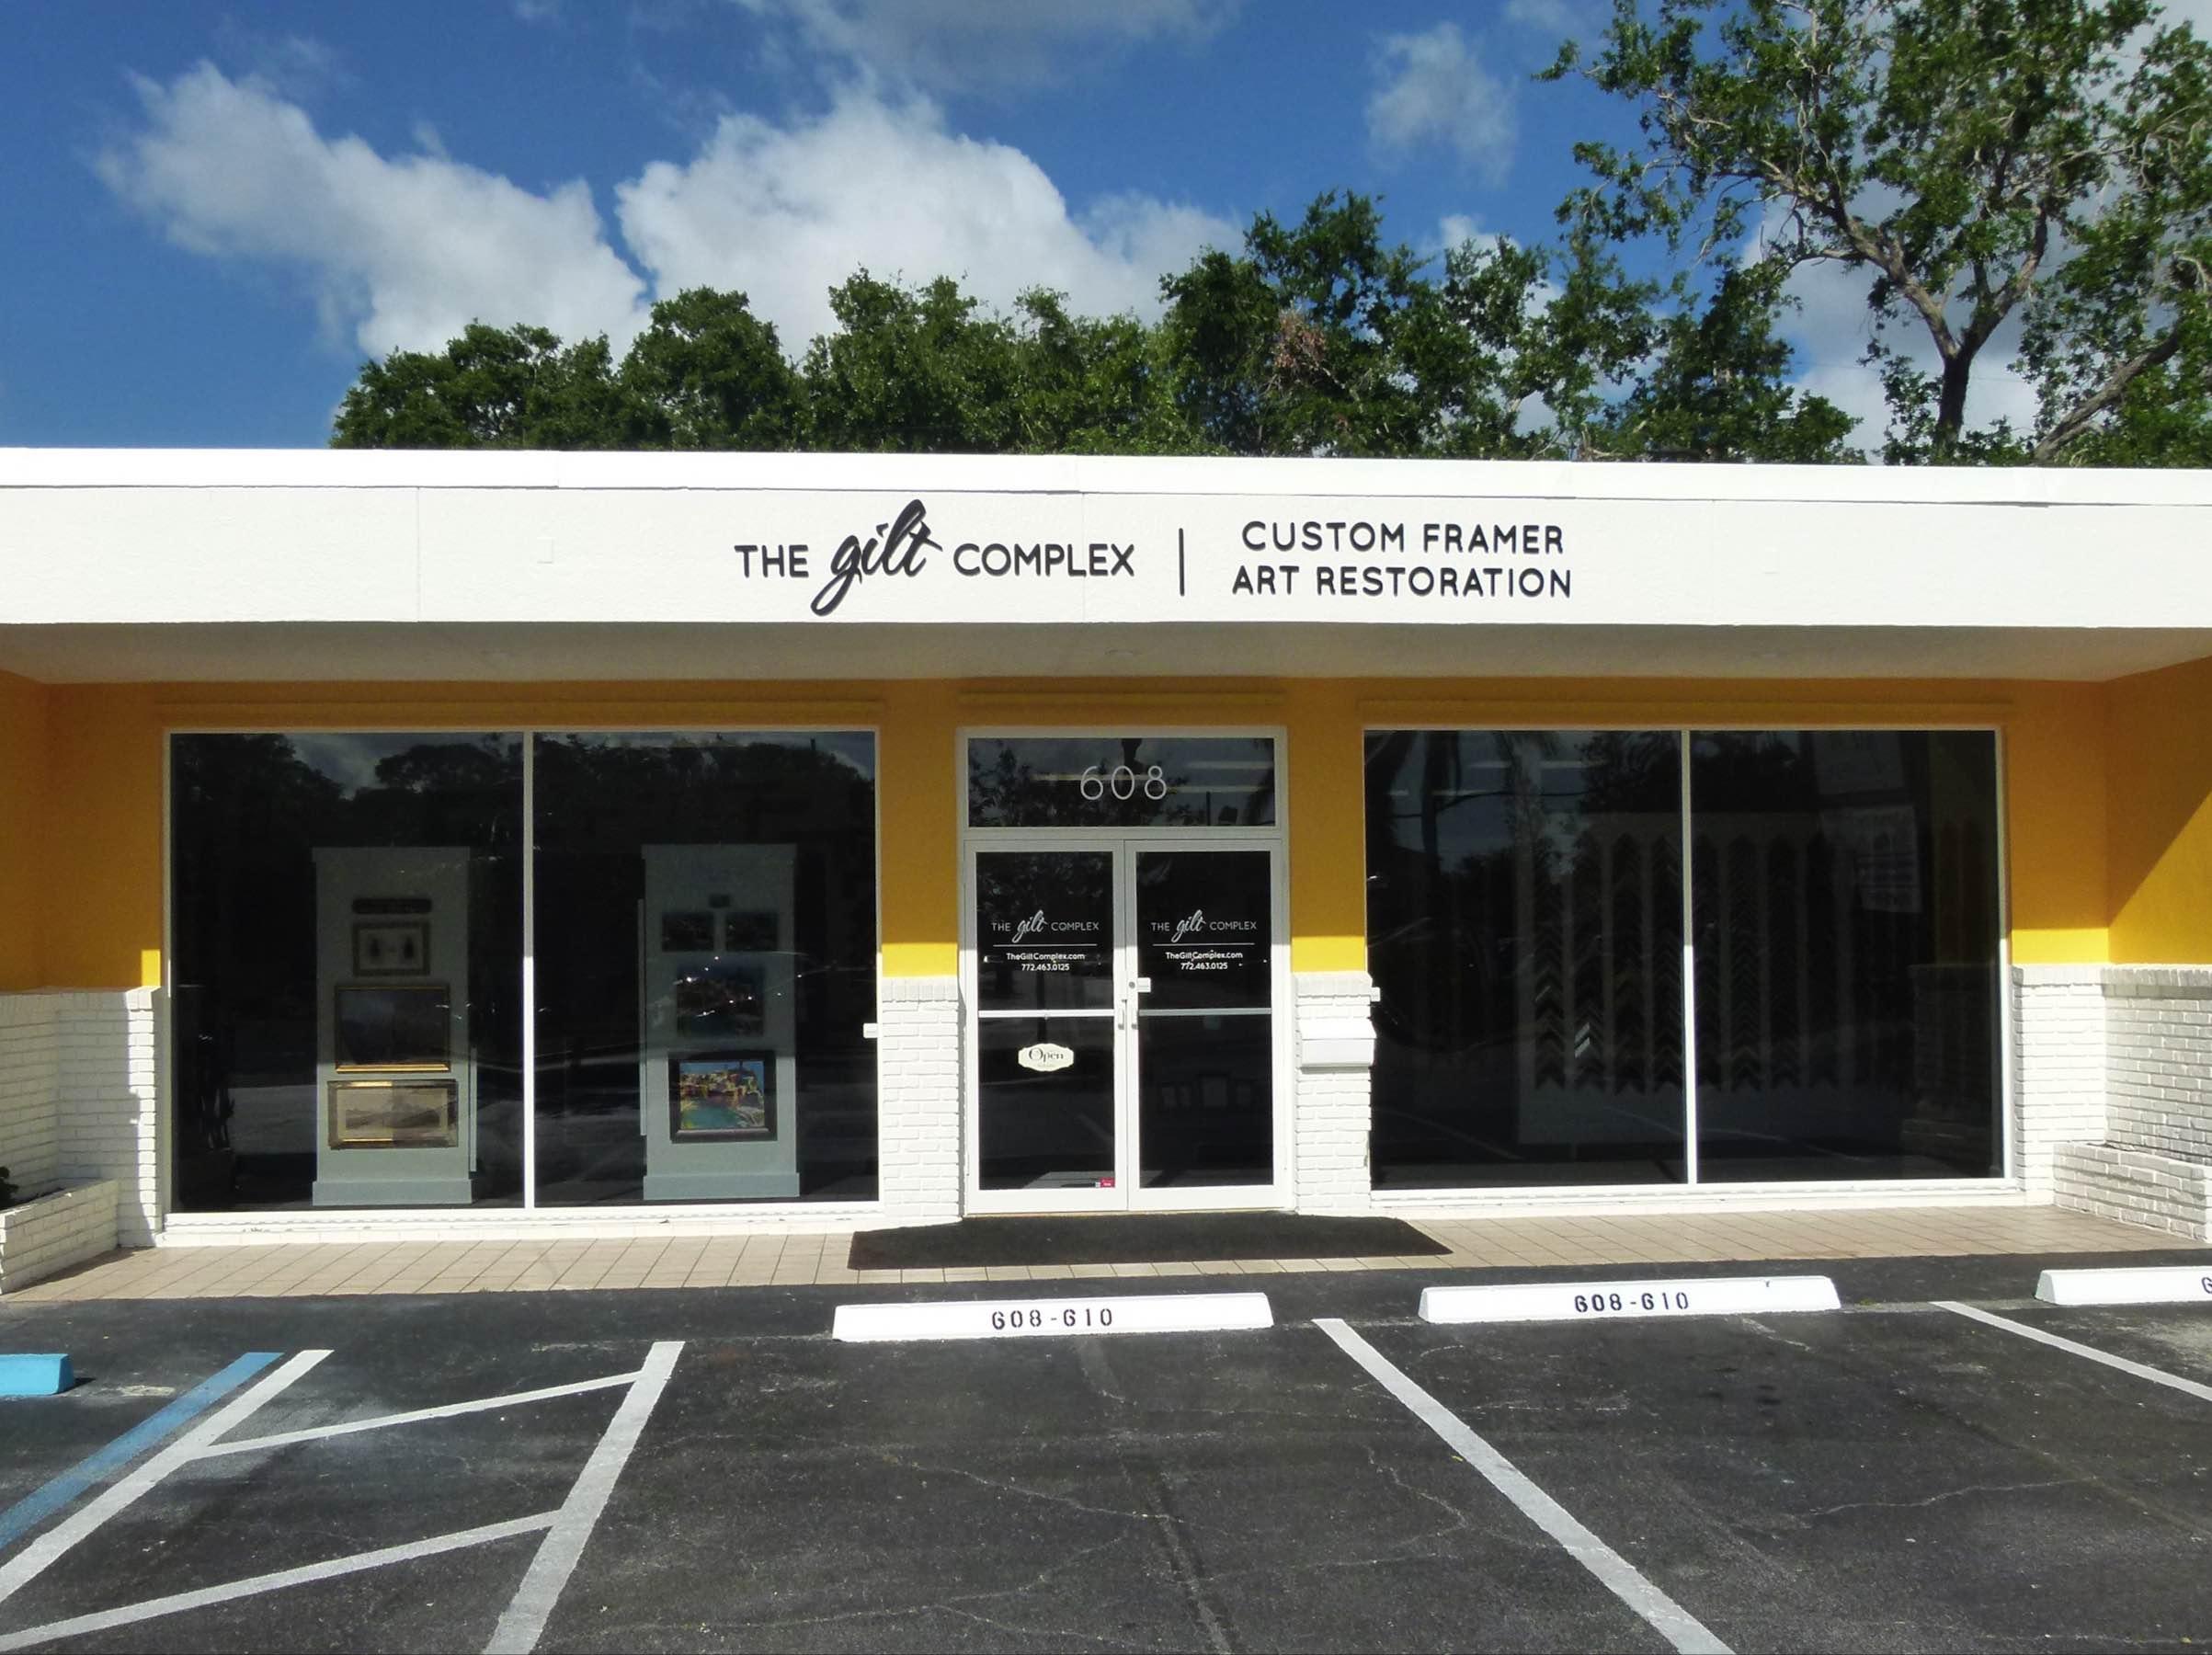 The Gilt Complex